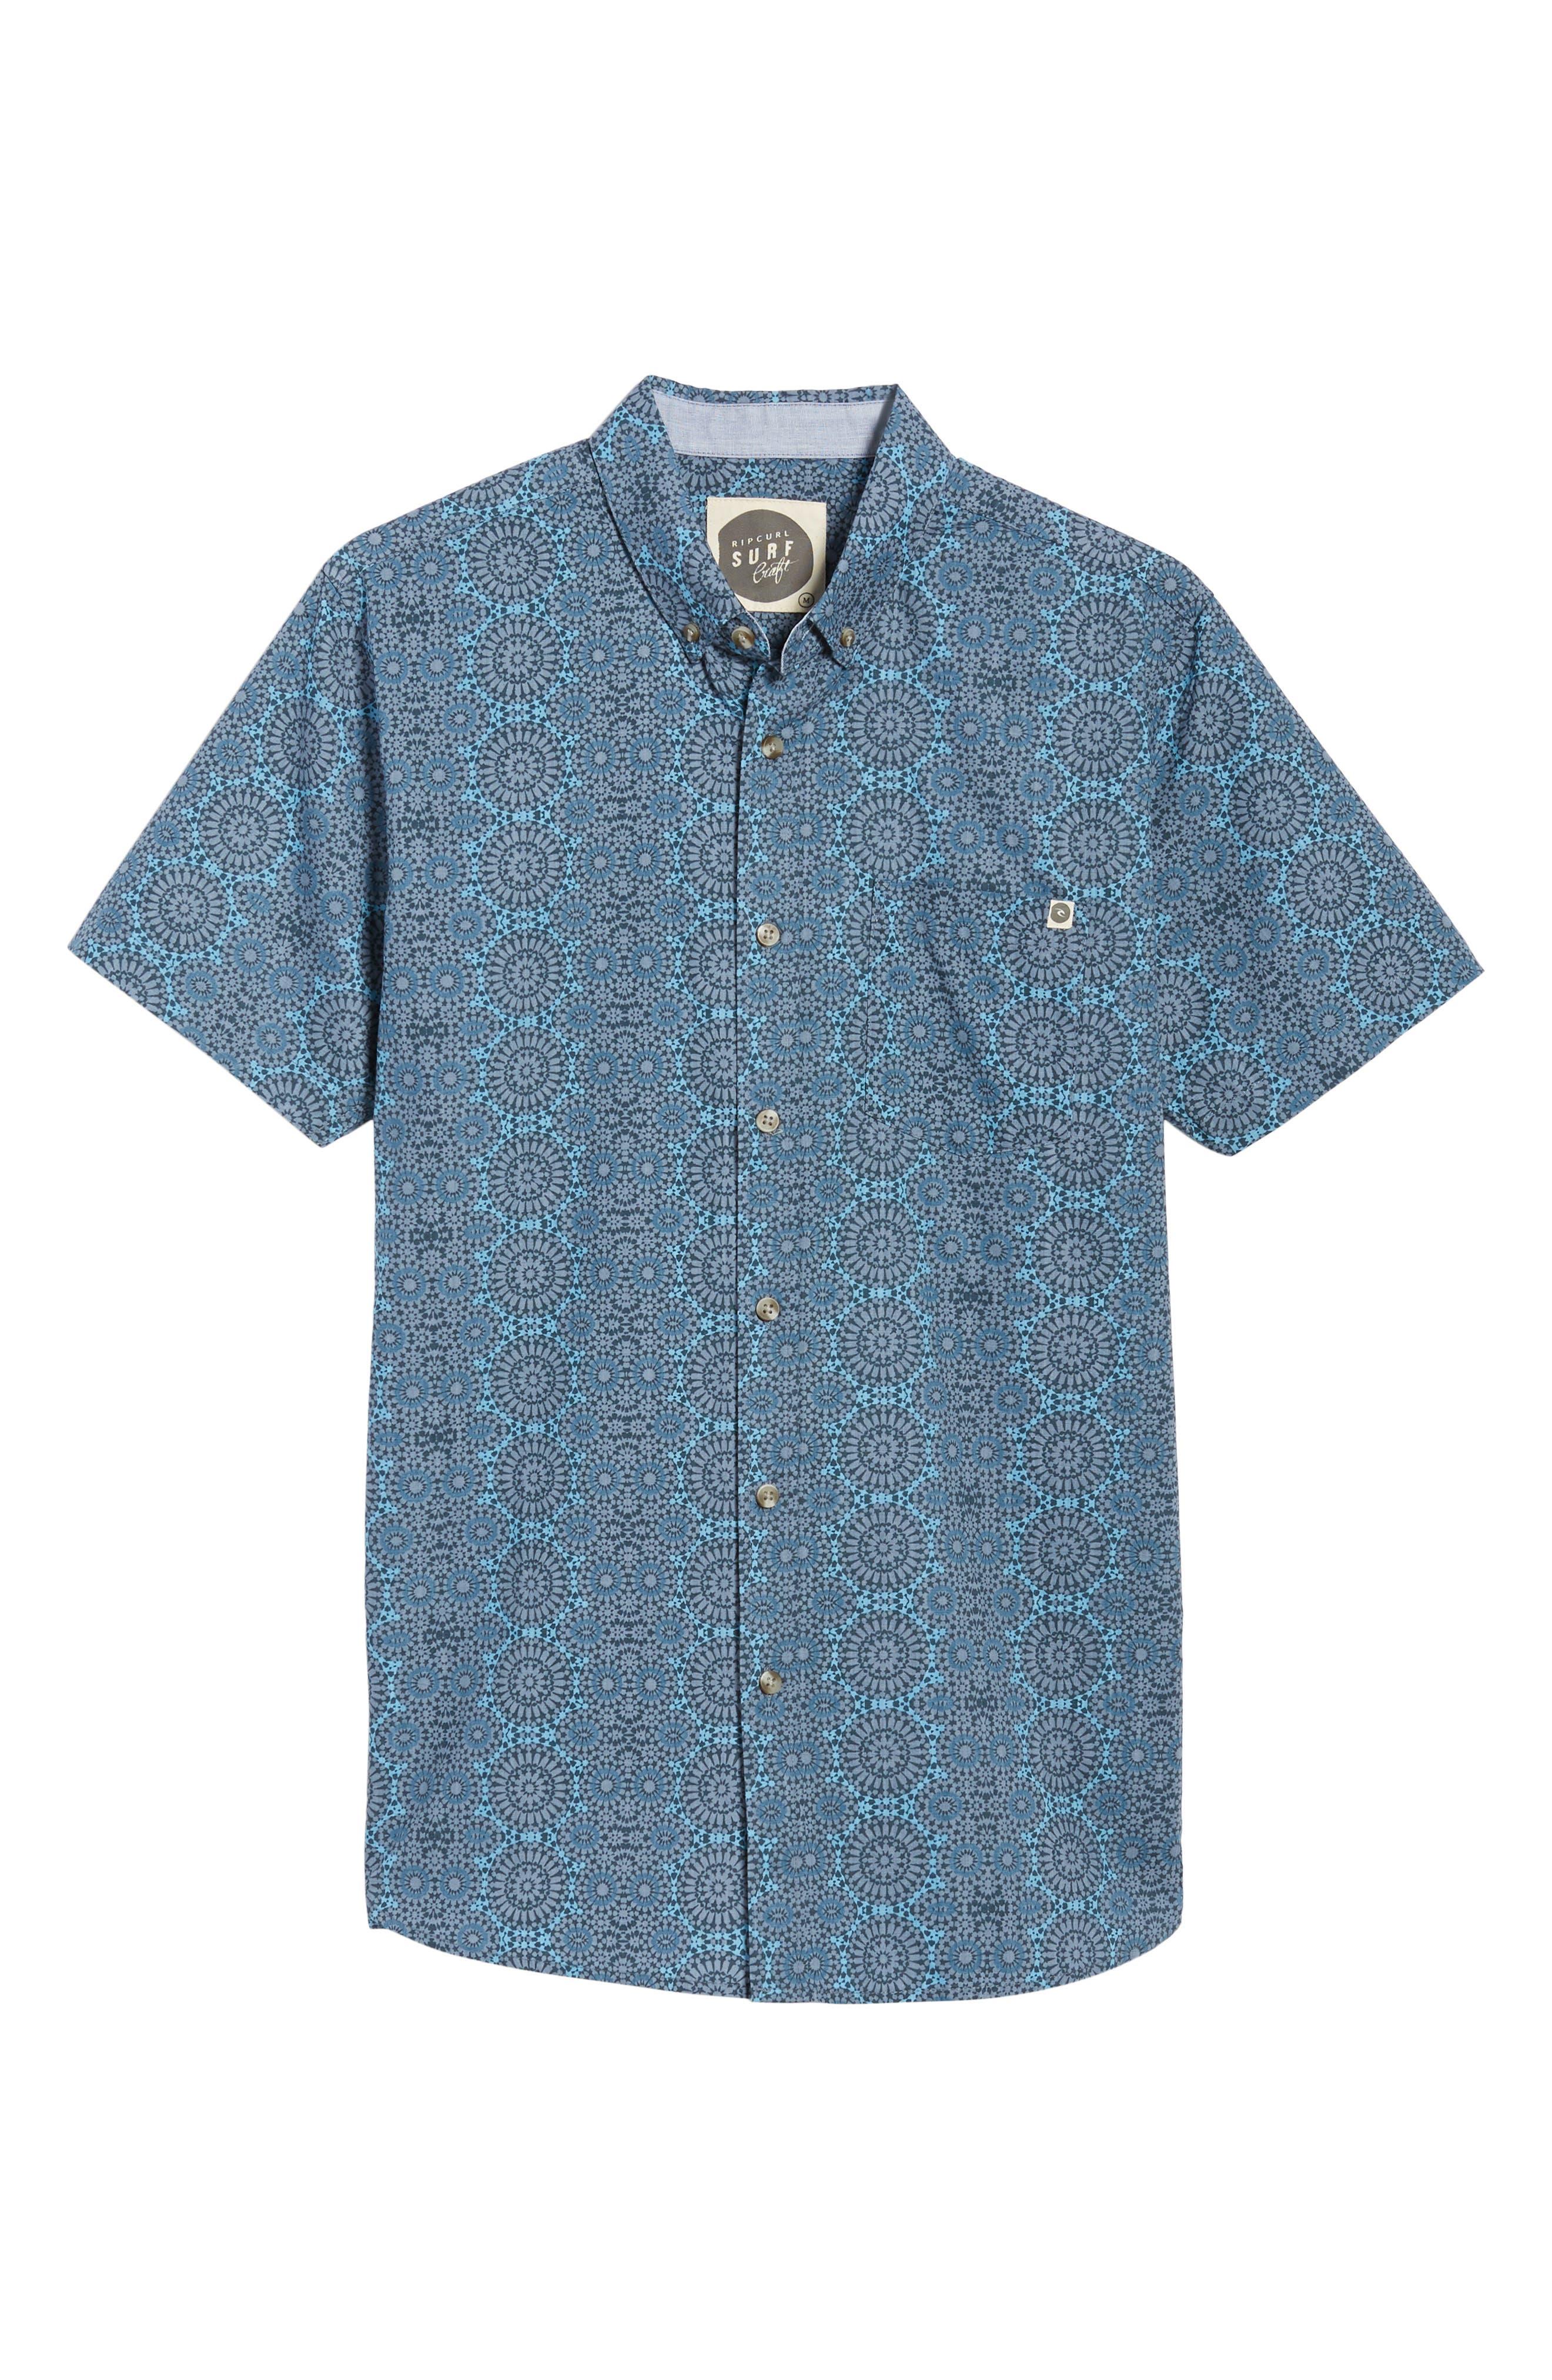 Scopic Woven Shirt,                             Alternate thumbnail 18, color,